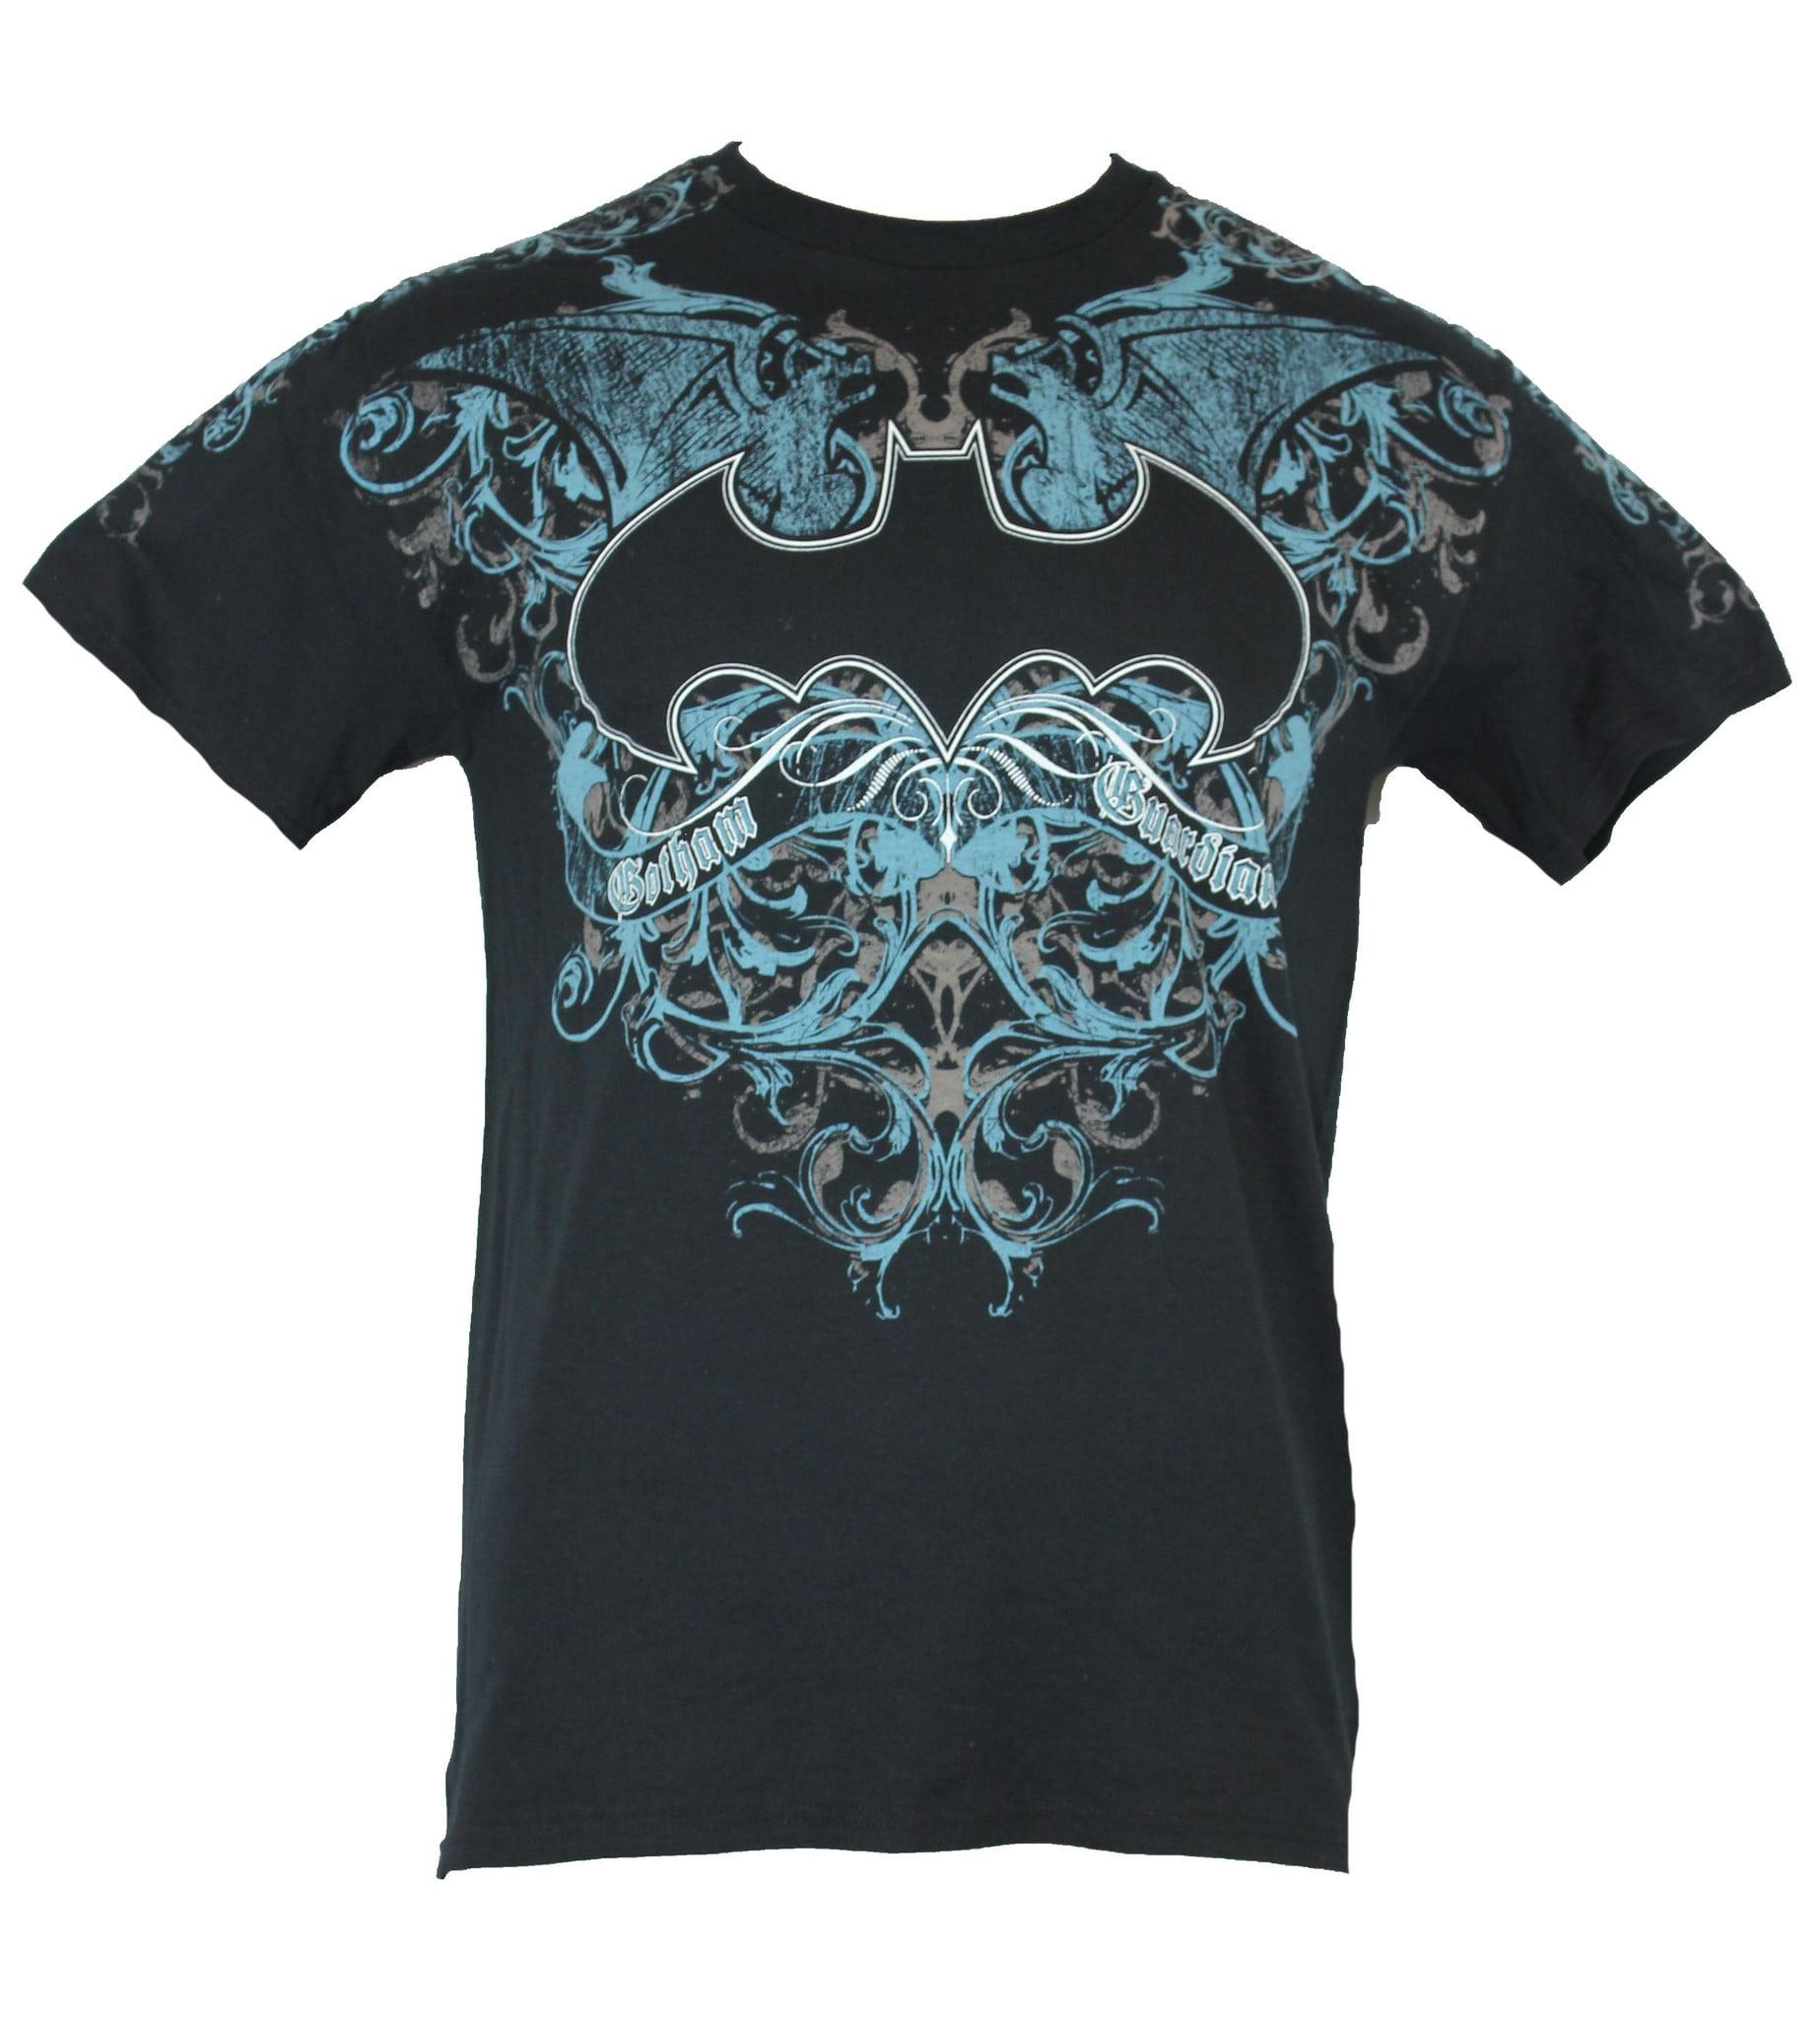 954265b3 Batman (DC Comics) Mens T-Shirt - Gotham Guardian Blue Ornate ...